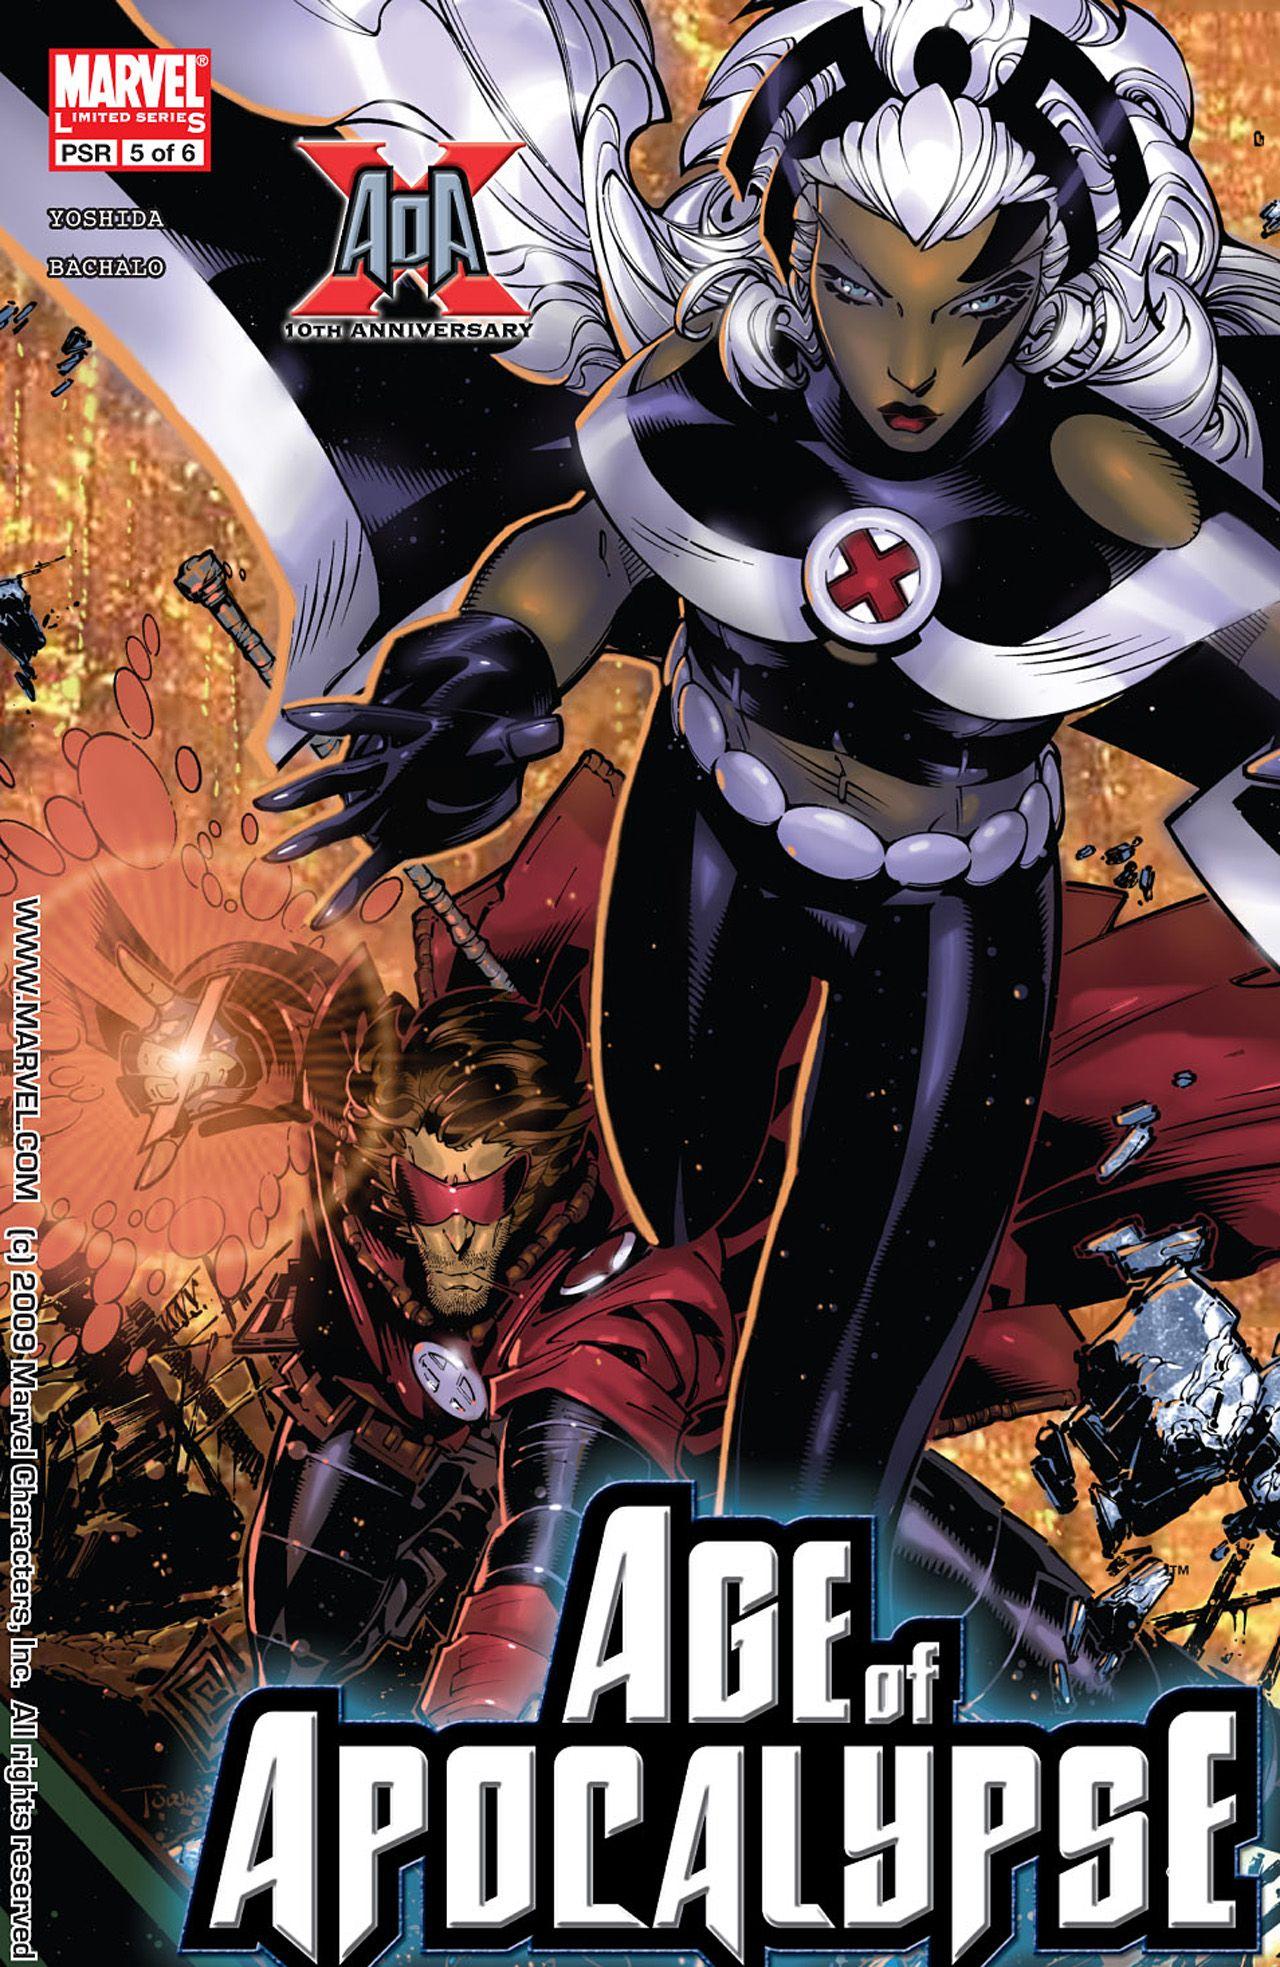 X Men Age Of Apocalypse 05 En 2020 Superheroes Marvel Personajes Comic Dibujos